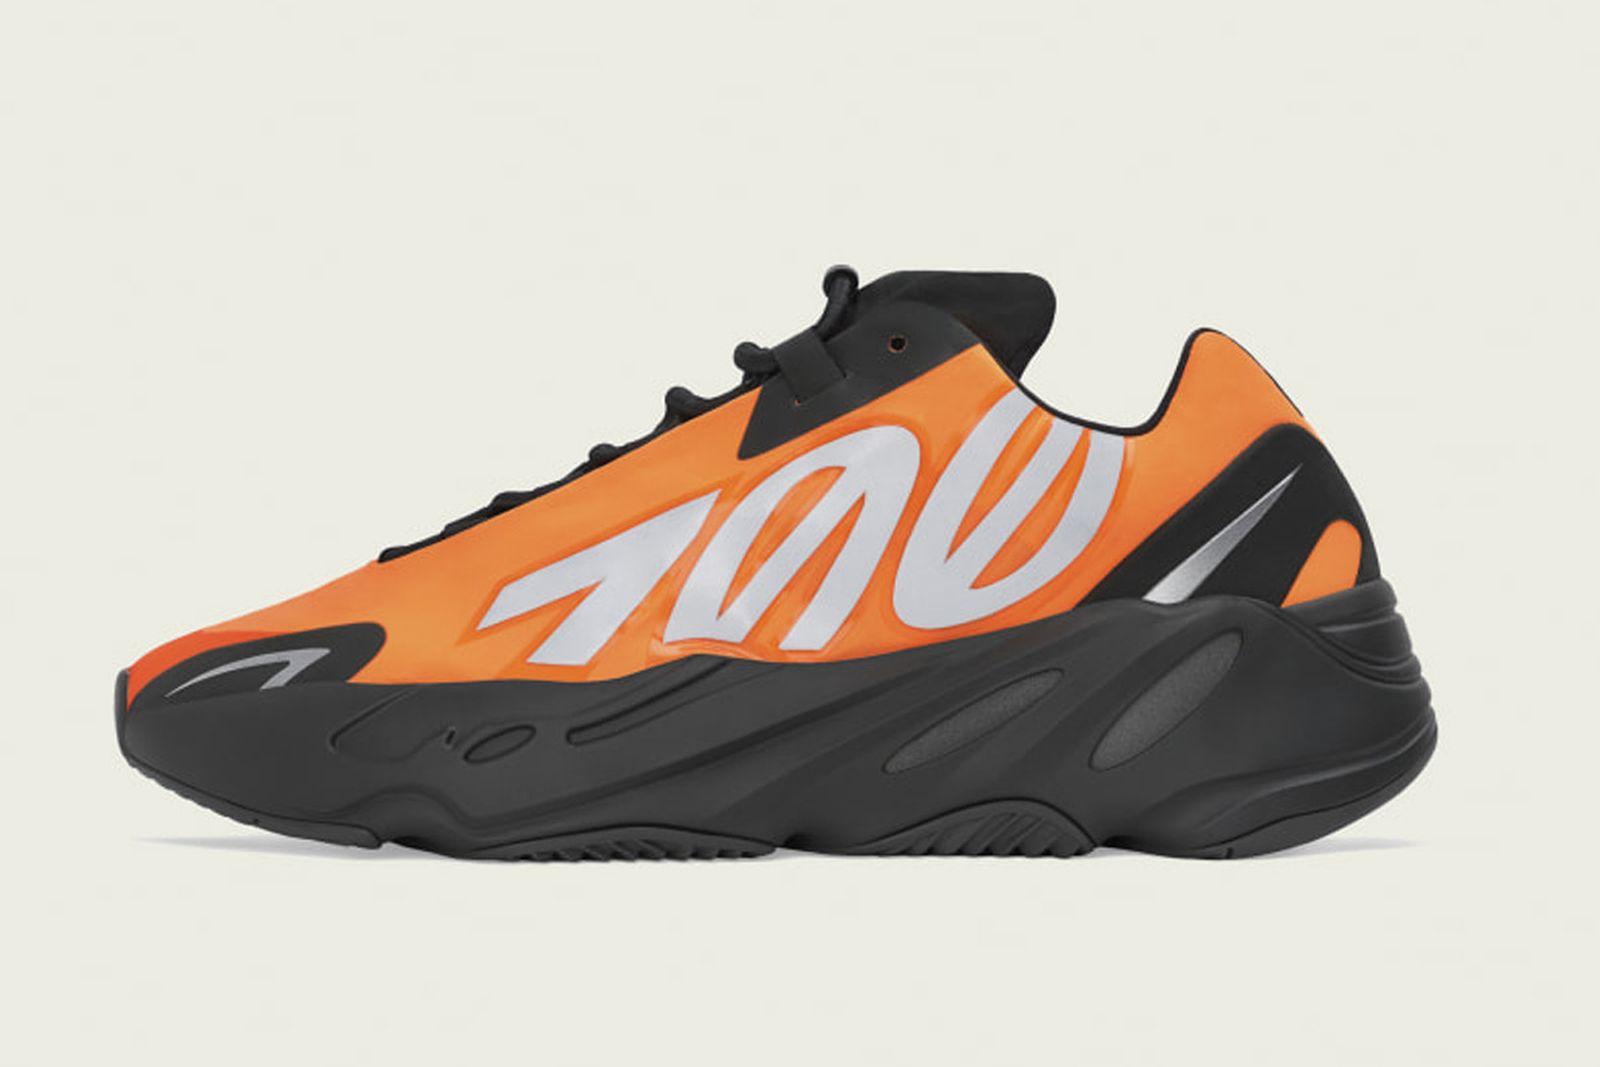 adidas-yeezy-boost-700-mnvn-orange-release-date-price-04